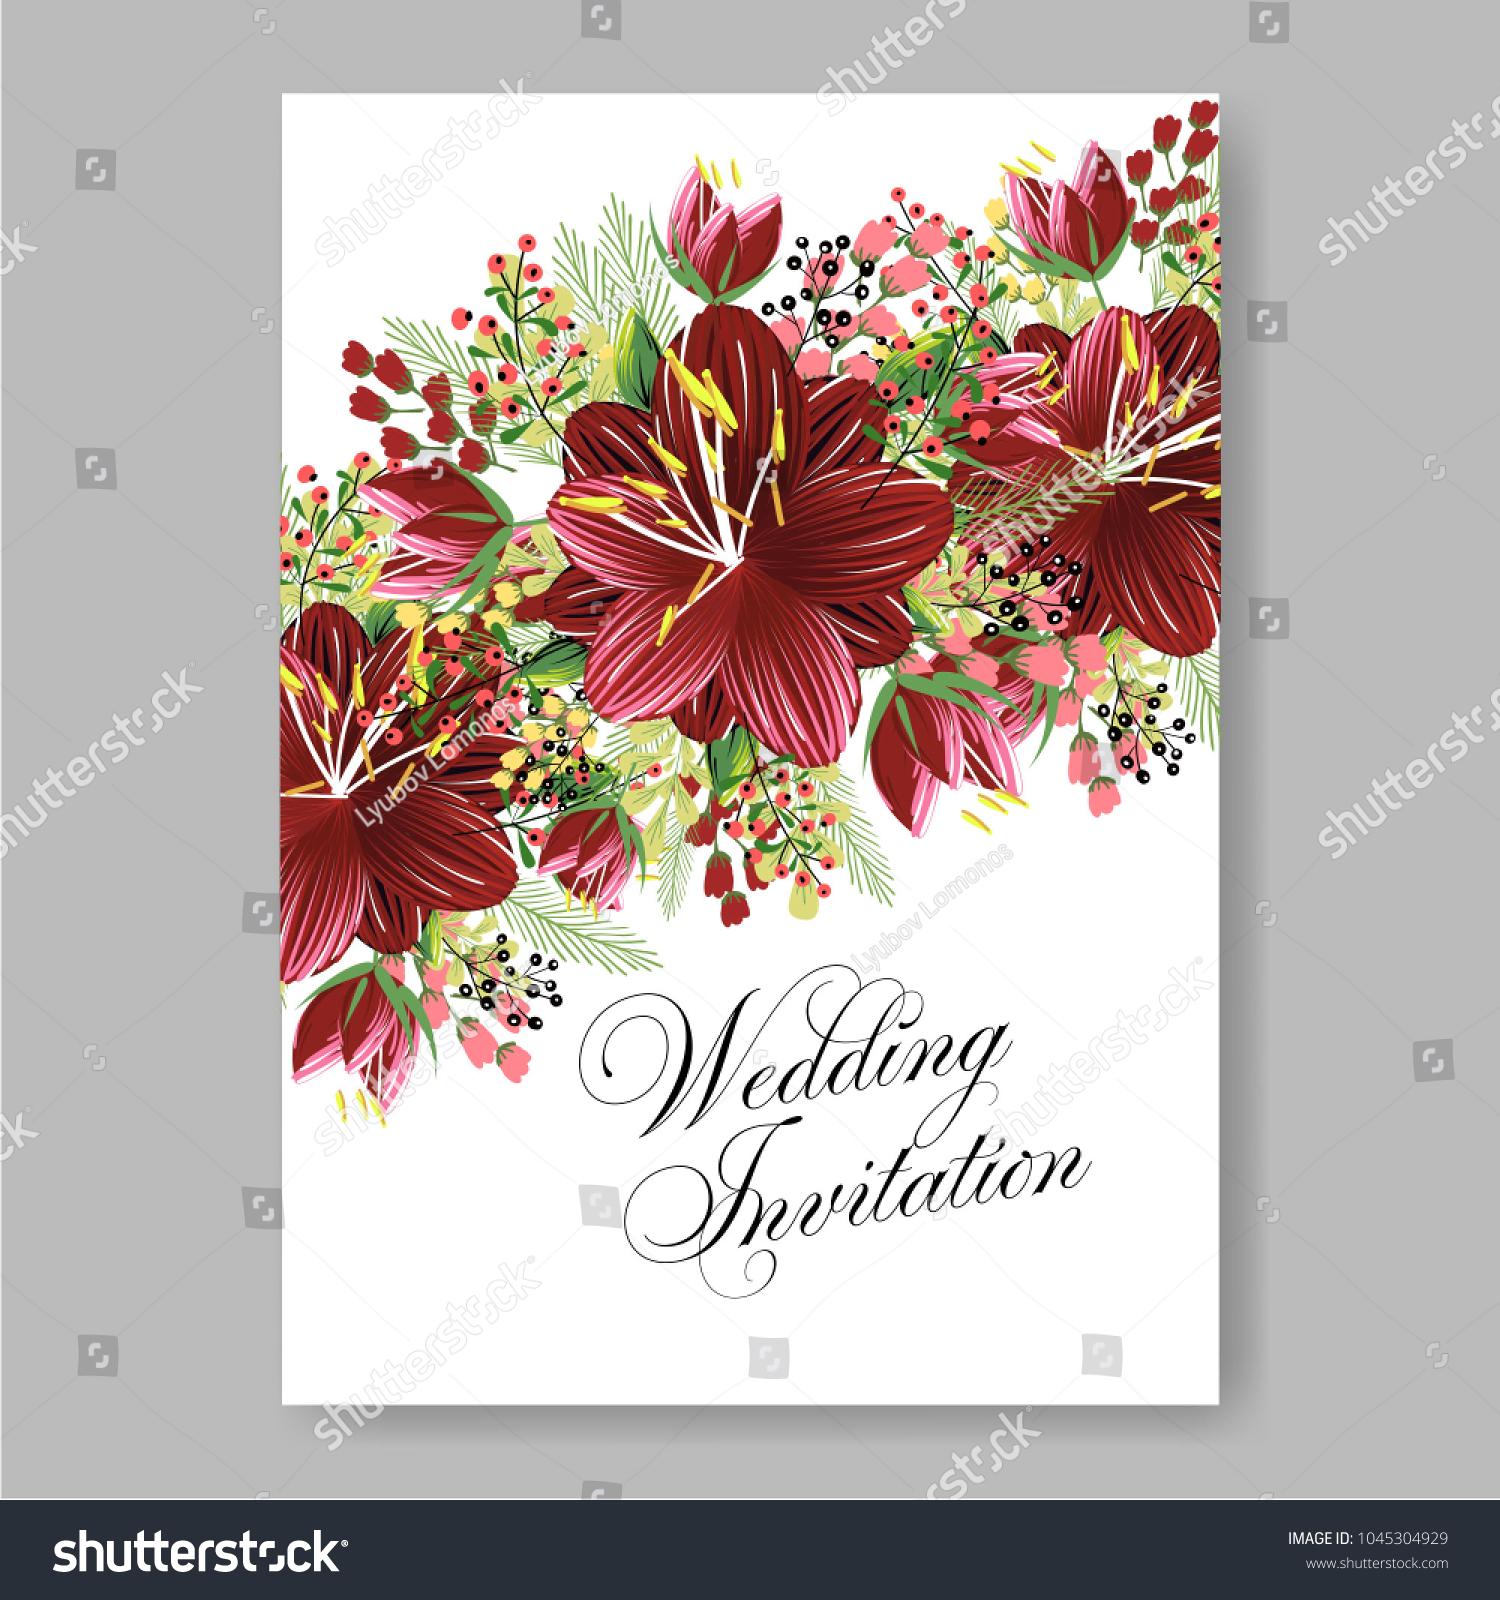 Wedding Invitation Aloha Marriage Hibiscus Floral Stock Vector ...